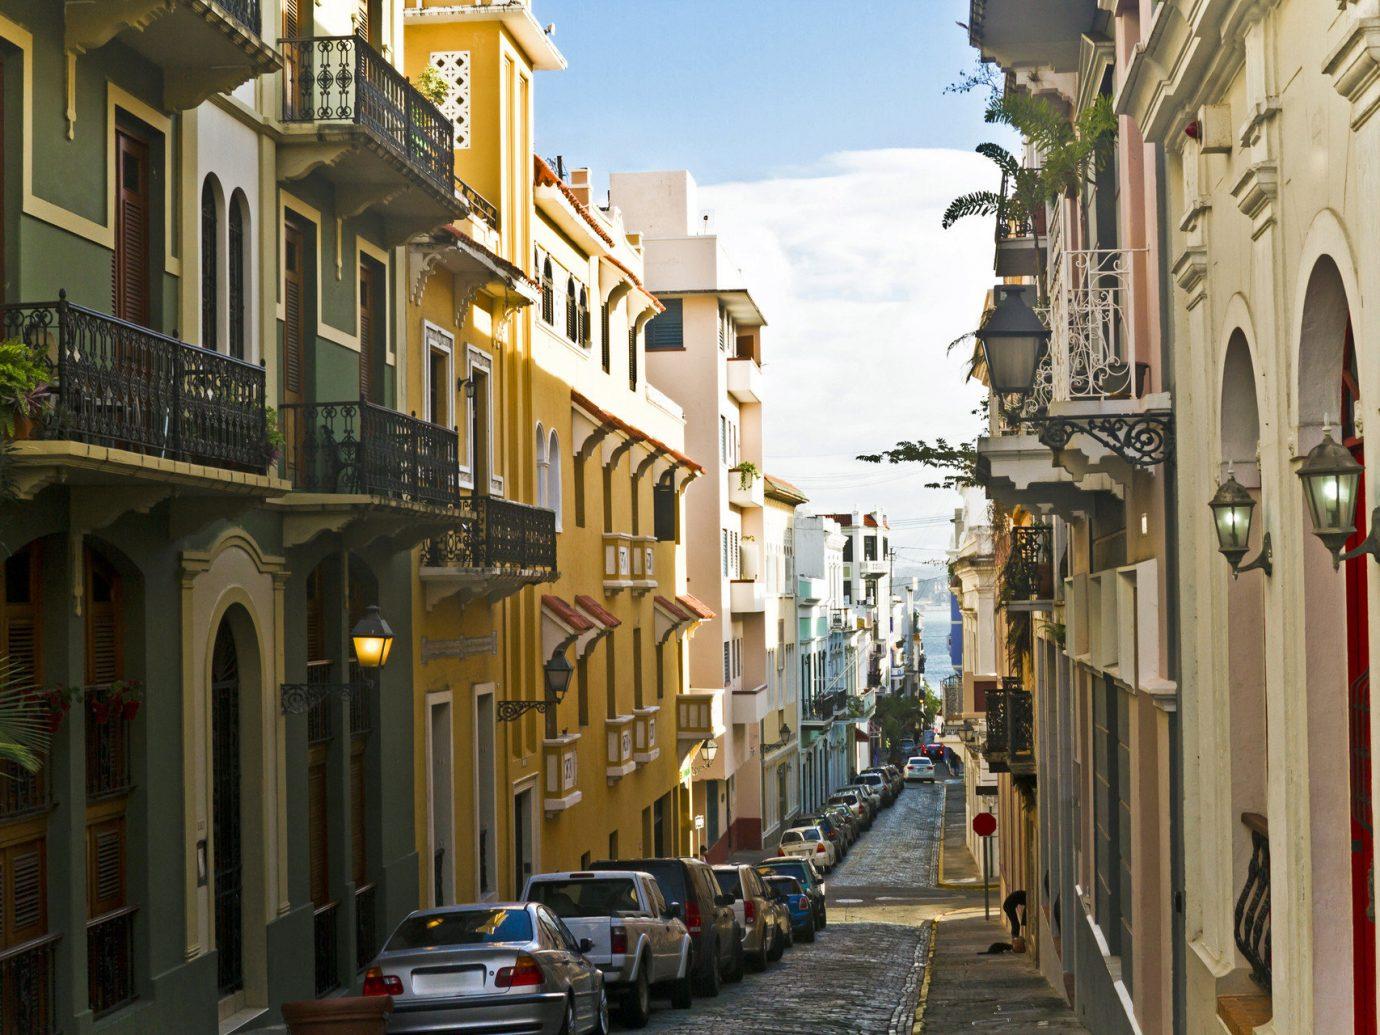 Narrow street in San Juan, Puerto Rico